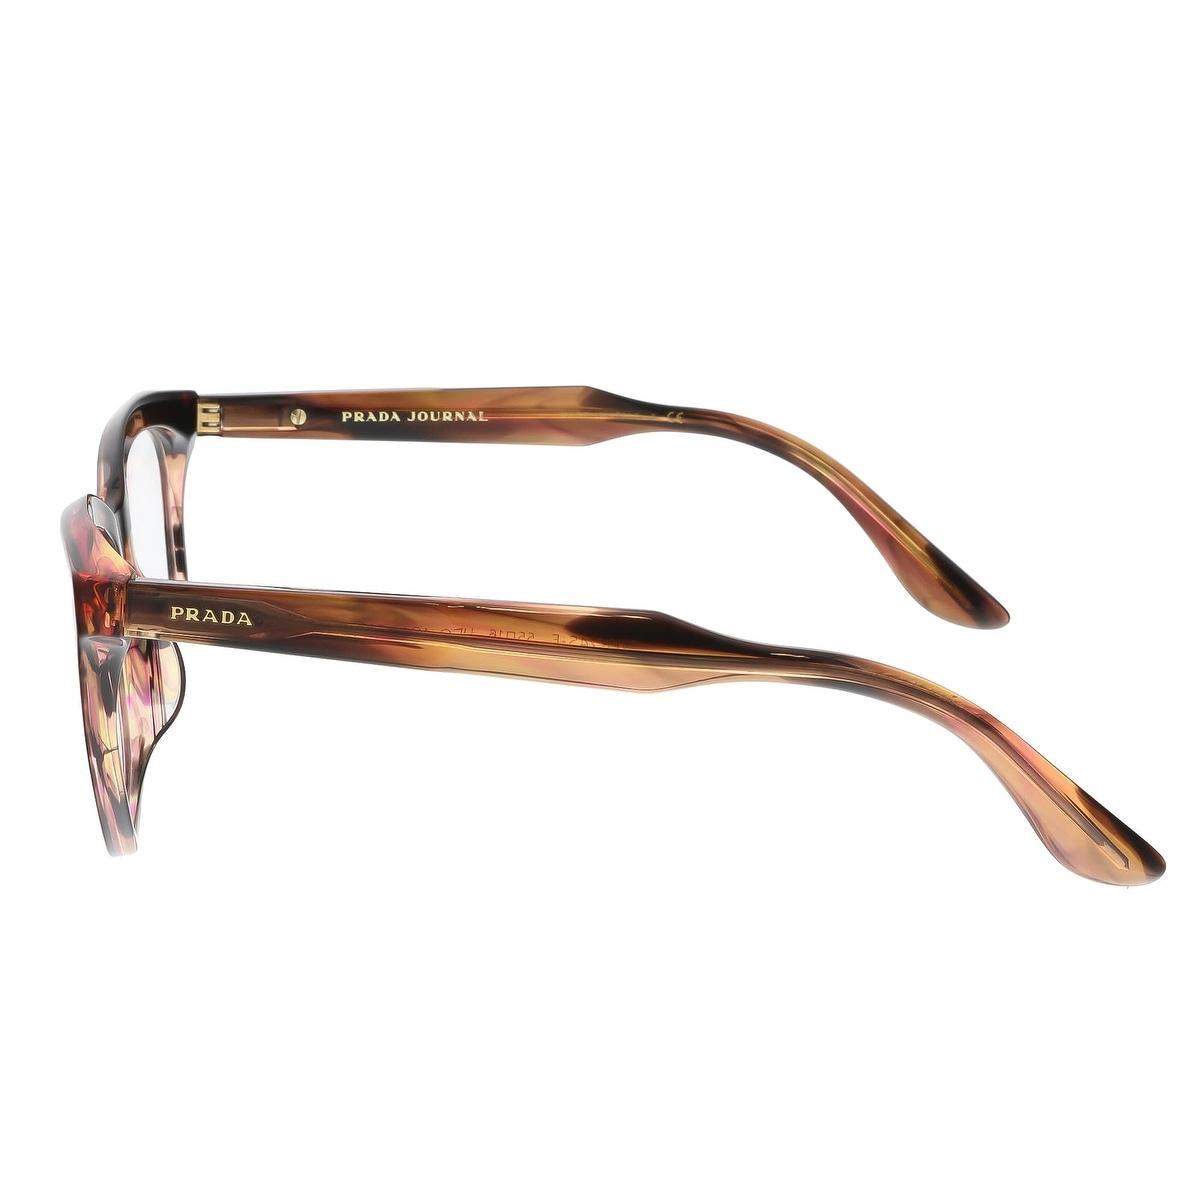 b6cdaffe8e Shop Prada PR 24SV UEO1O1 55 Striped Brown Cateye Journal Optical Frames -  55-16-140 - Free Shipping Today - Overstock - 17768383